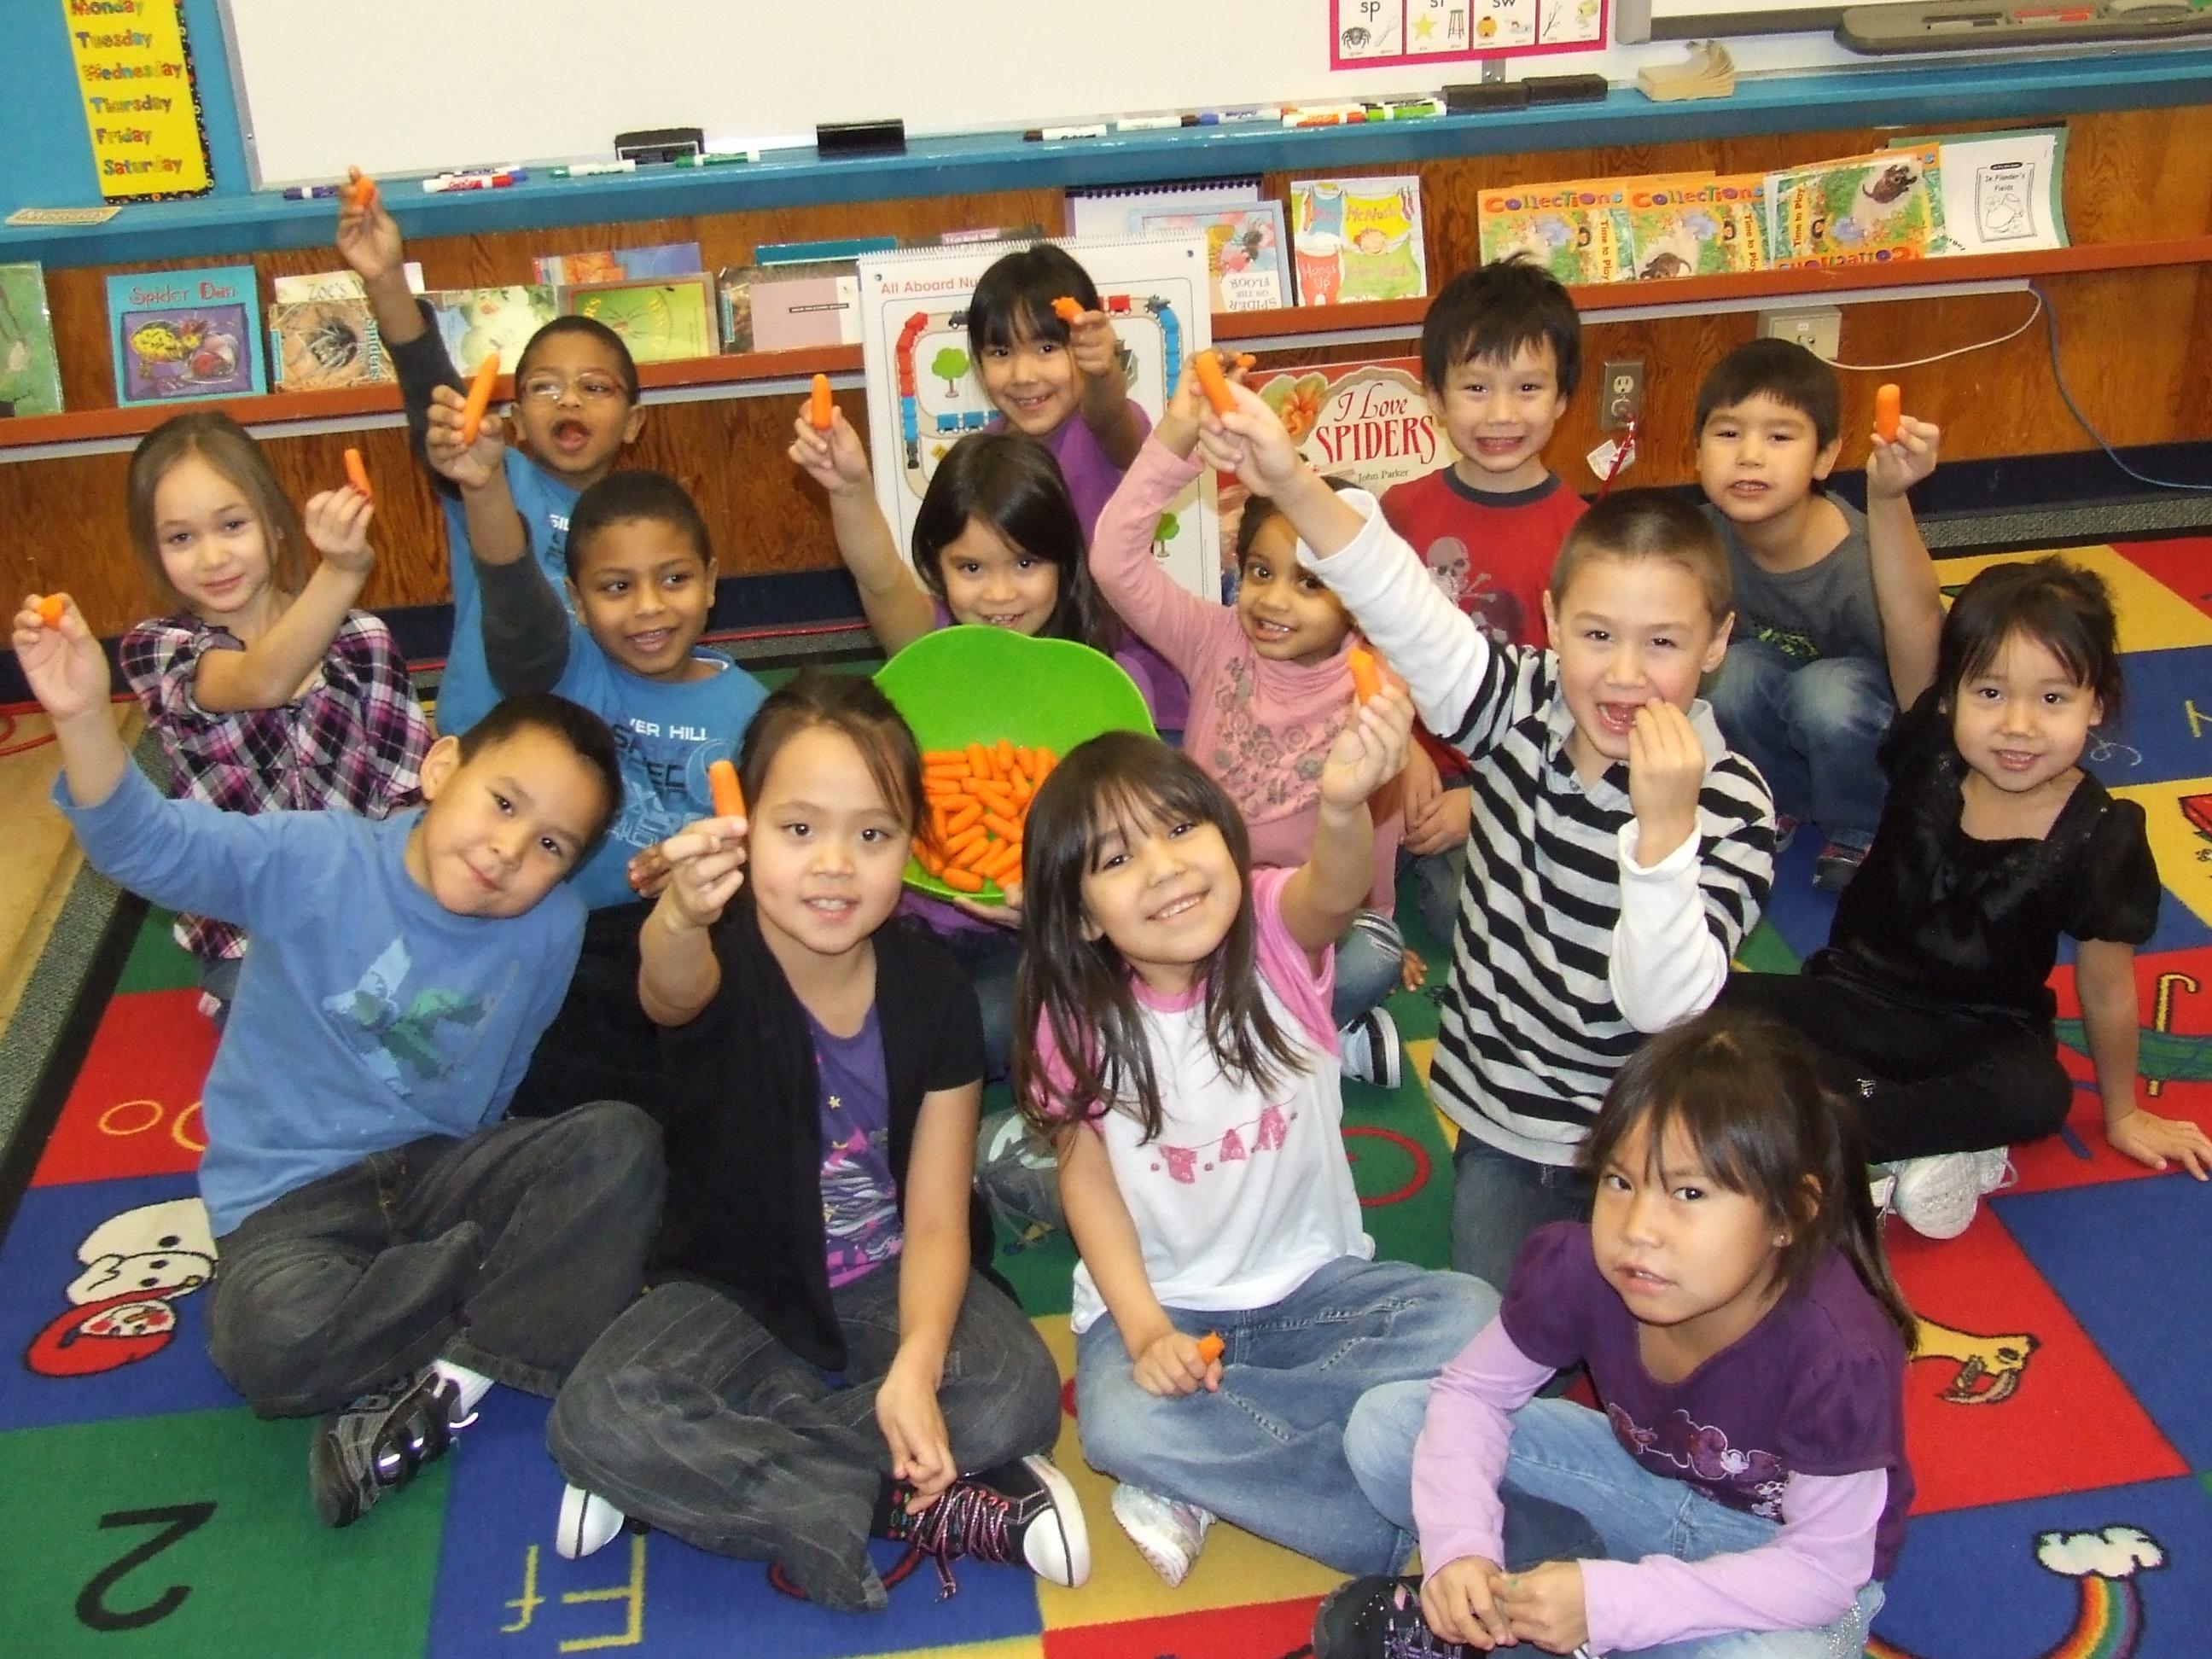 Children in classroom eating carrots